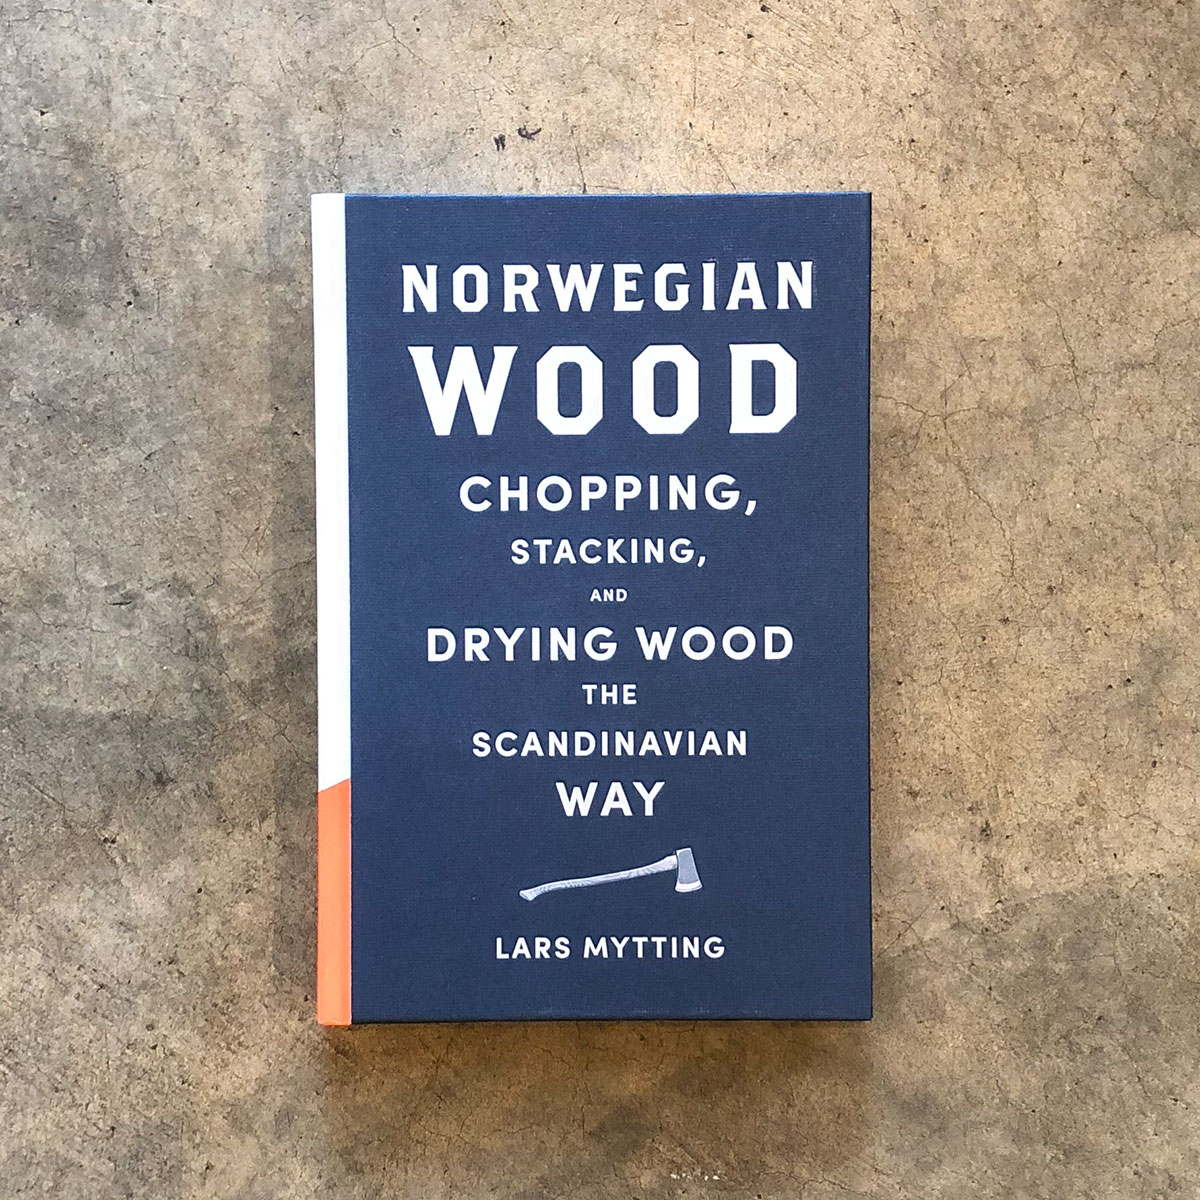 LARS MYTTING - Norwegian Wood — CORD